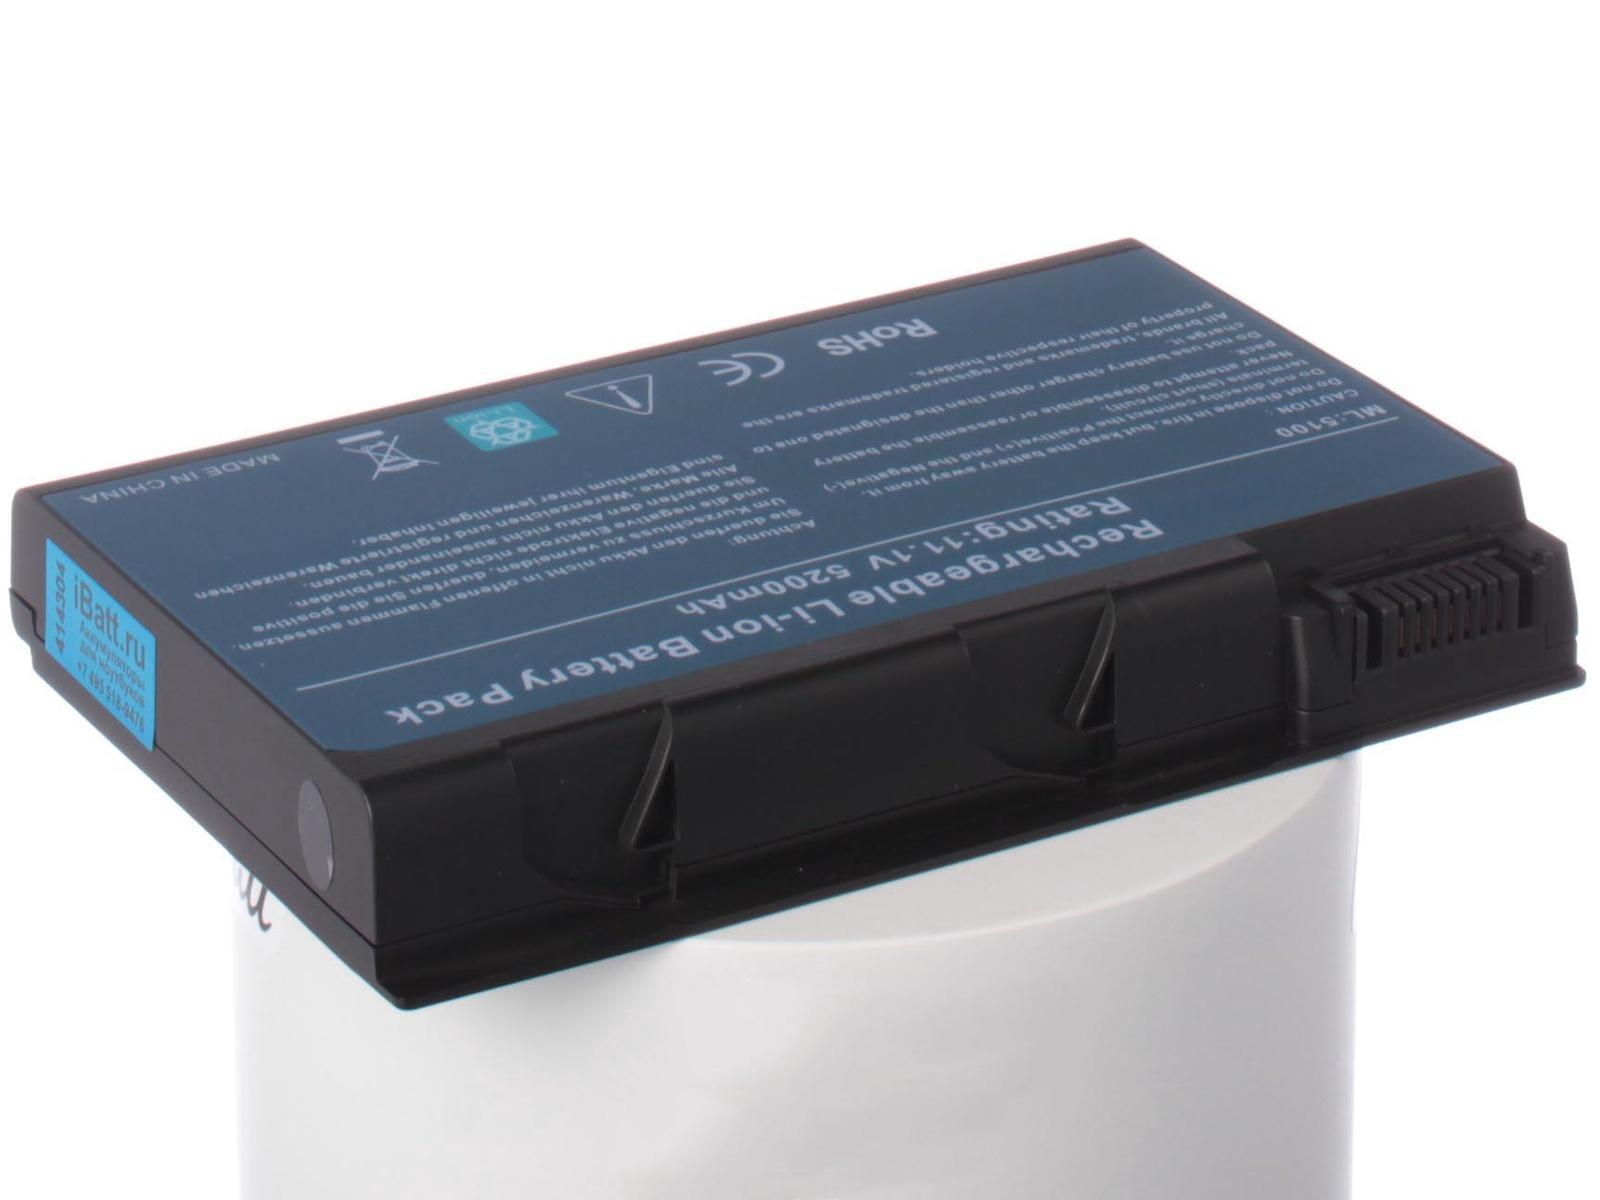 Аккумулятор для ноутбука iBatt для Acer Aspire 3692, Aspire 9802, Aspire 5611AWLMI, TravelMate 4233WLMi, Aspire 5103WLMI, TravelMate 5510, TravelMate 4202WLMi, Aspire 5102AWLMi, Aspire 5610Z, Aspire 5112, Aspire 9802WKMi acer aspire switch 10